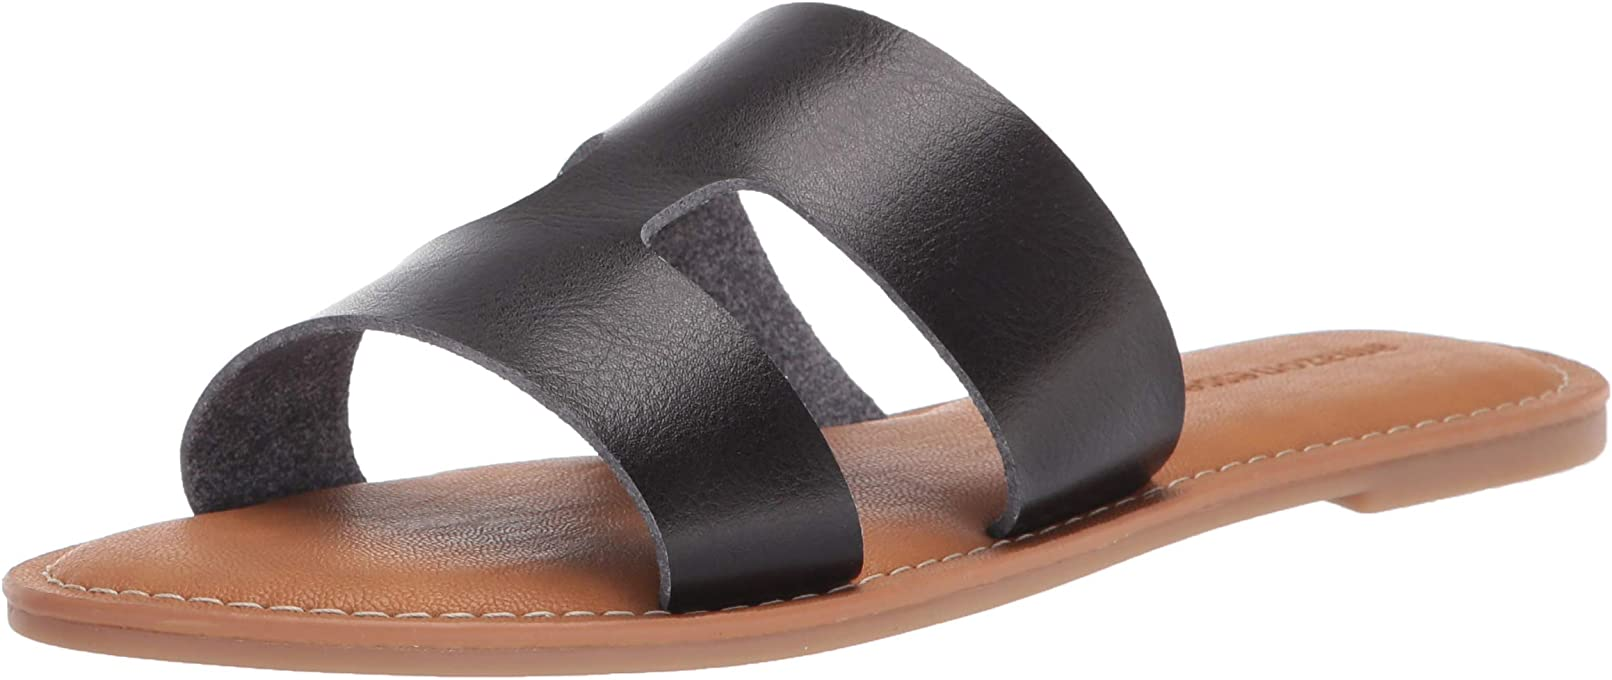 Amazon Essentials - H Band Flat Sandal, flats-sandals Donna